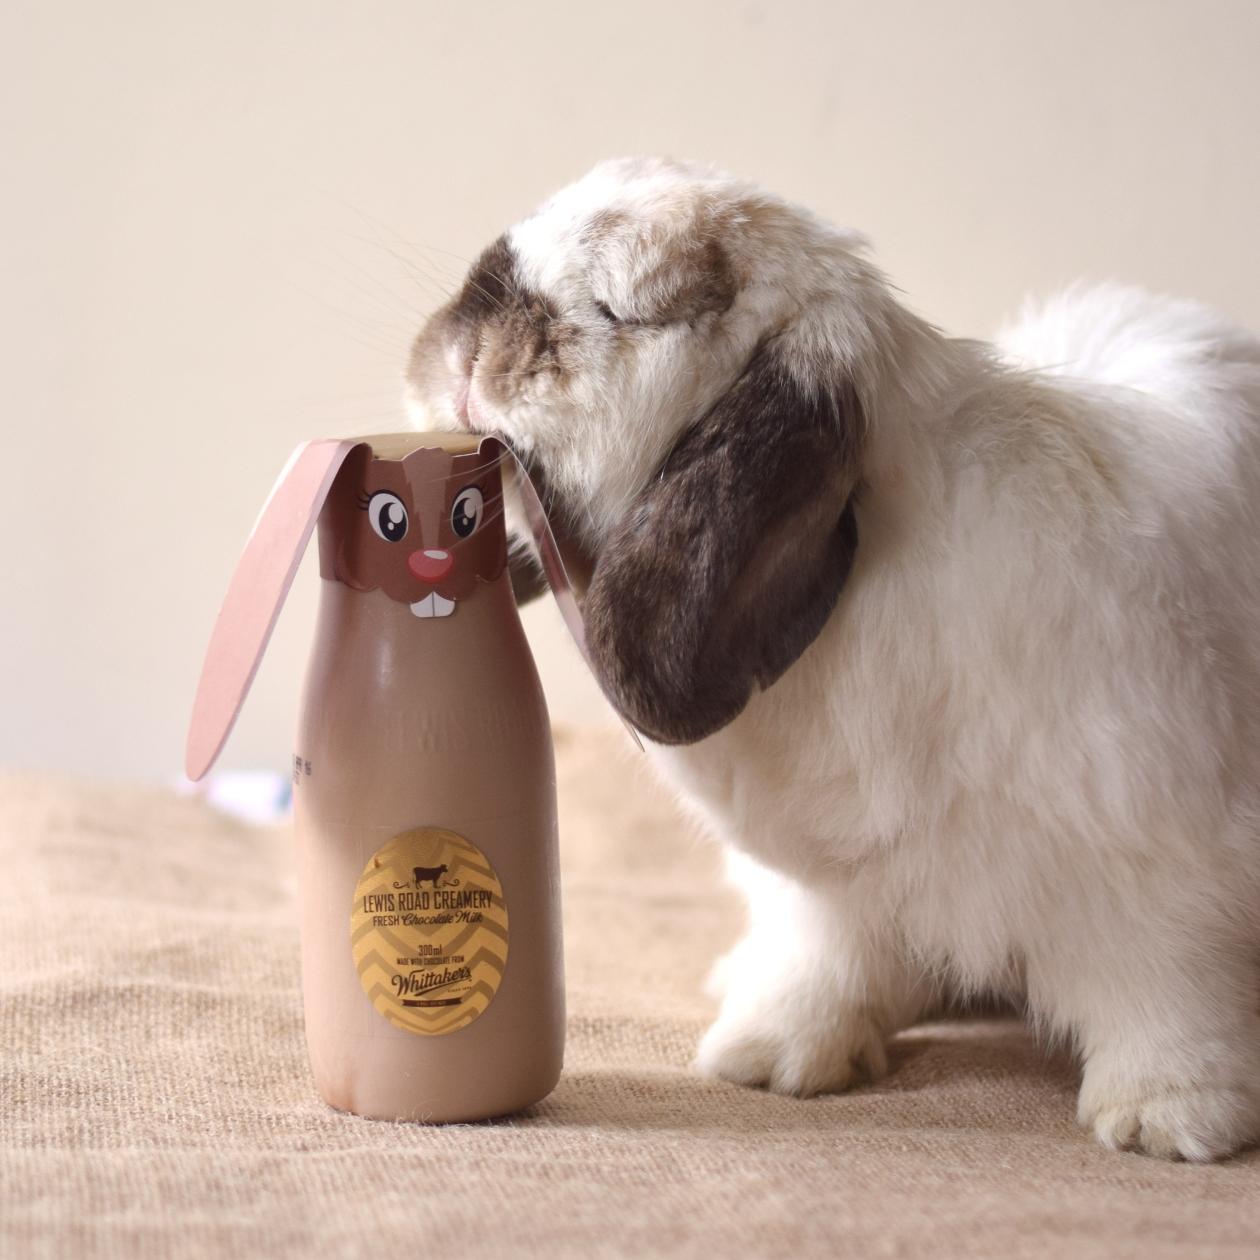 tofu-lewis-road-bunny004